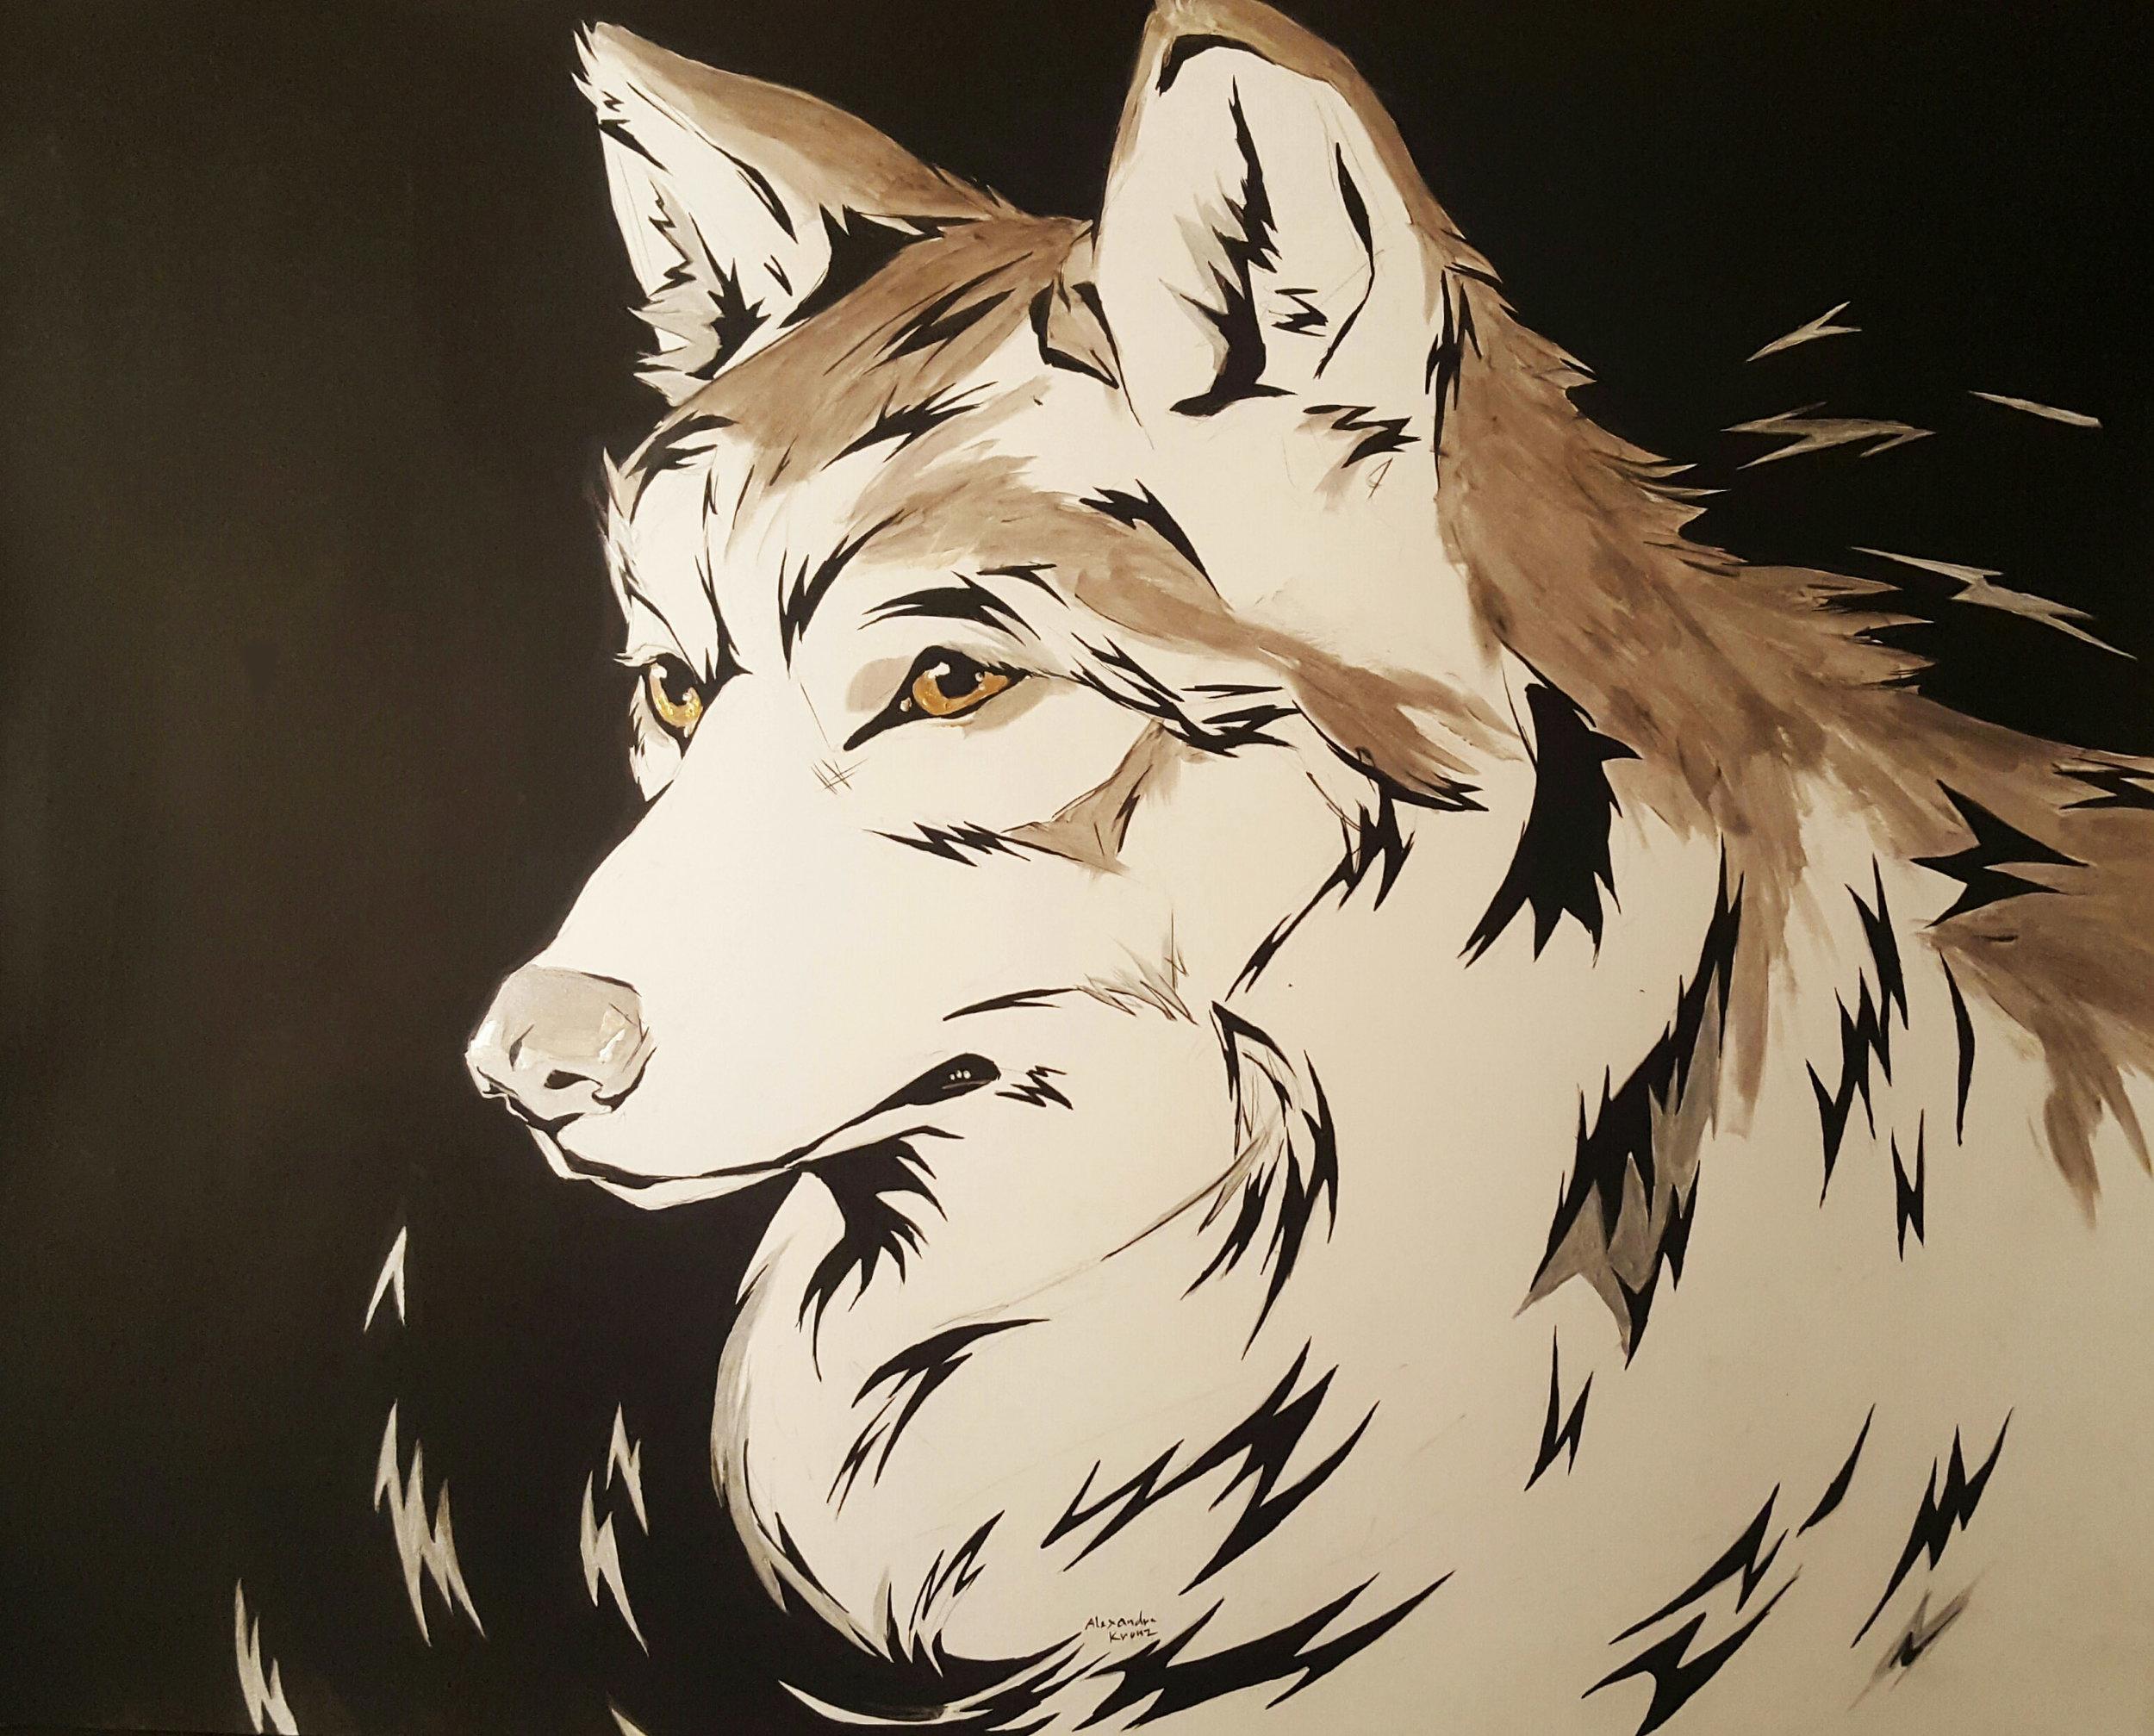 acrylic on bristol paper